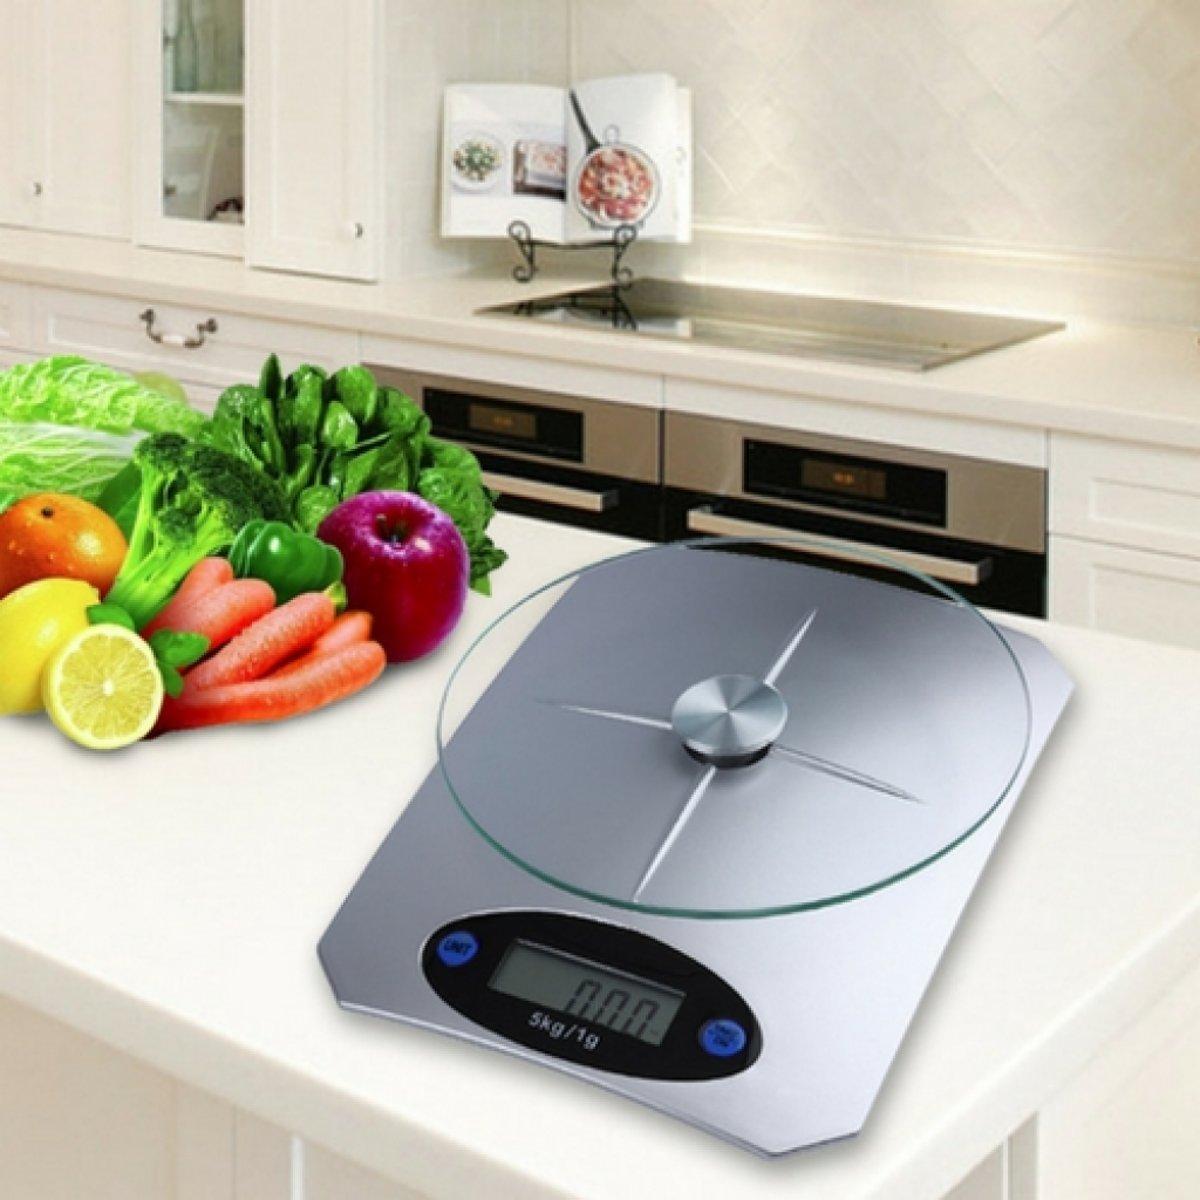 Keuken weegschaal | Elektronische keukenweegschaal | Keuken gadgets | Weegschaal RVS